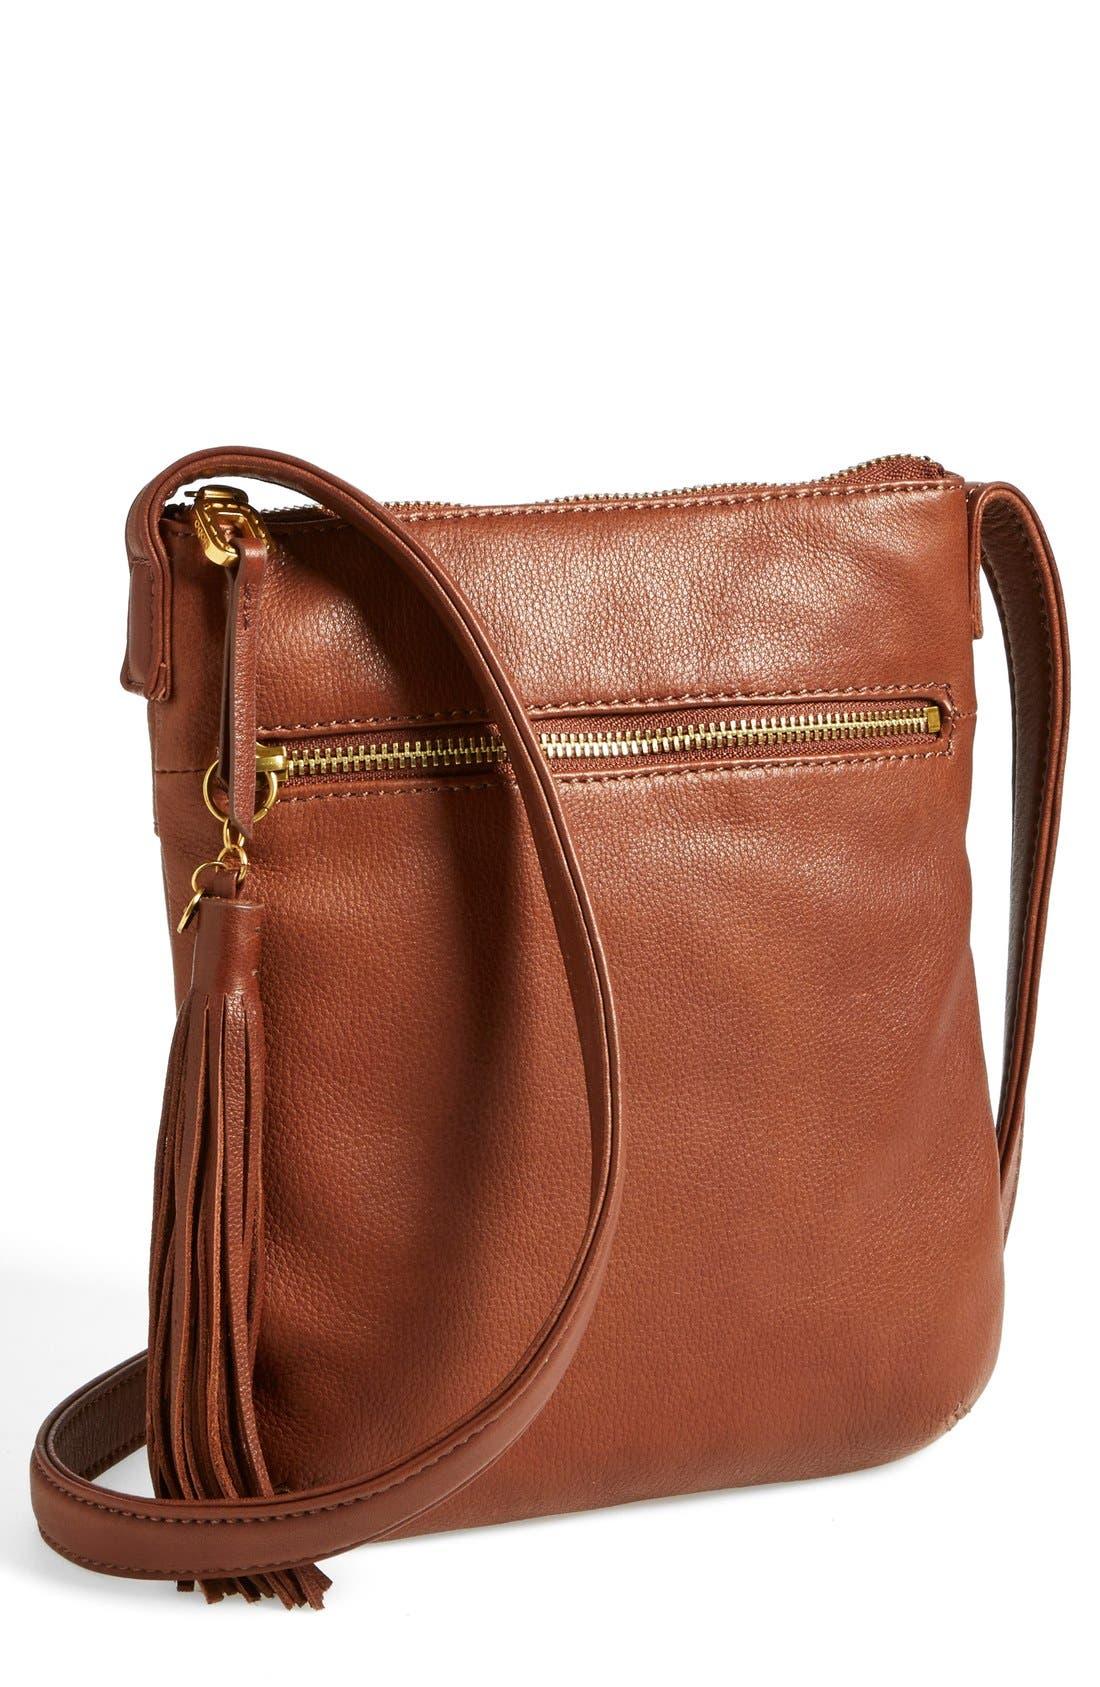 'Sarah' Leather Crossbody Bag,                             Main thumbnail 3, color,